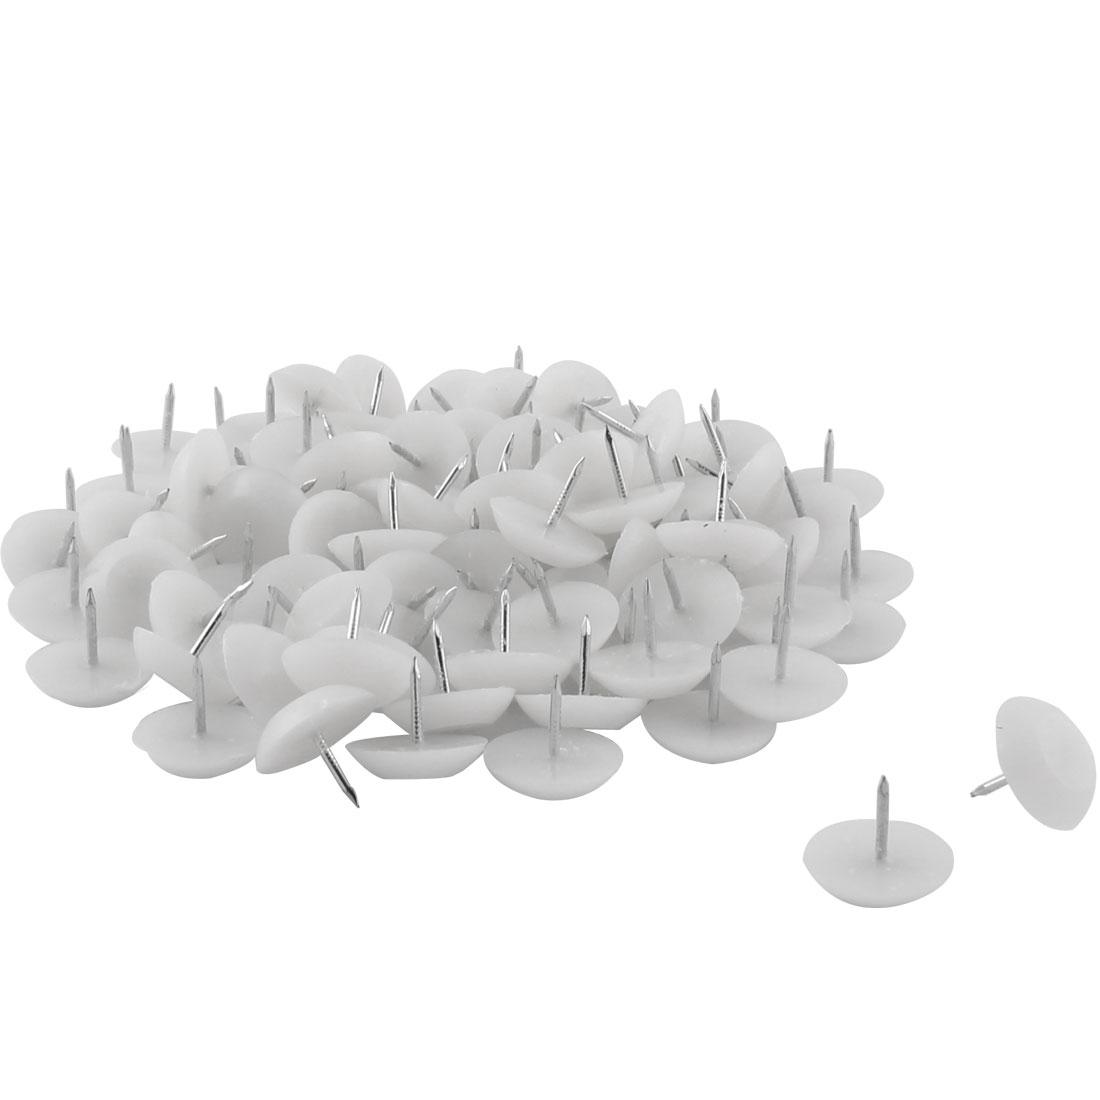 Furniture Chair Table Plastic Leg Feet Protector Non-slip Nails White 2cm Dia 100pcs